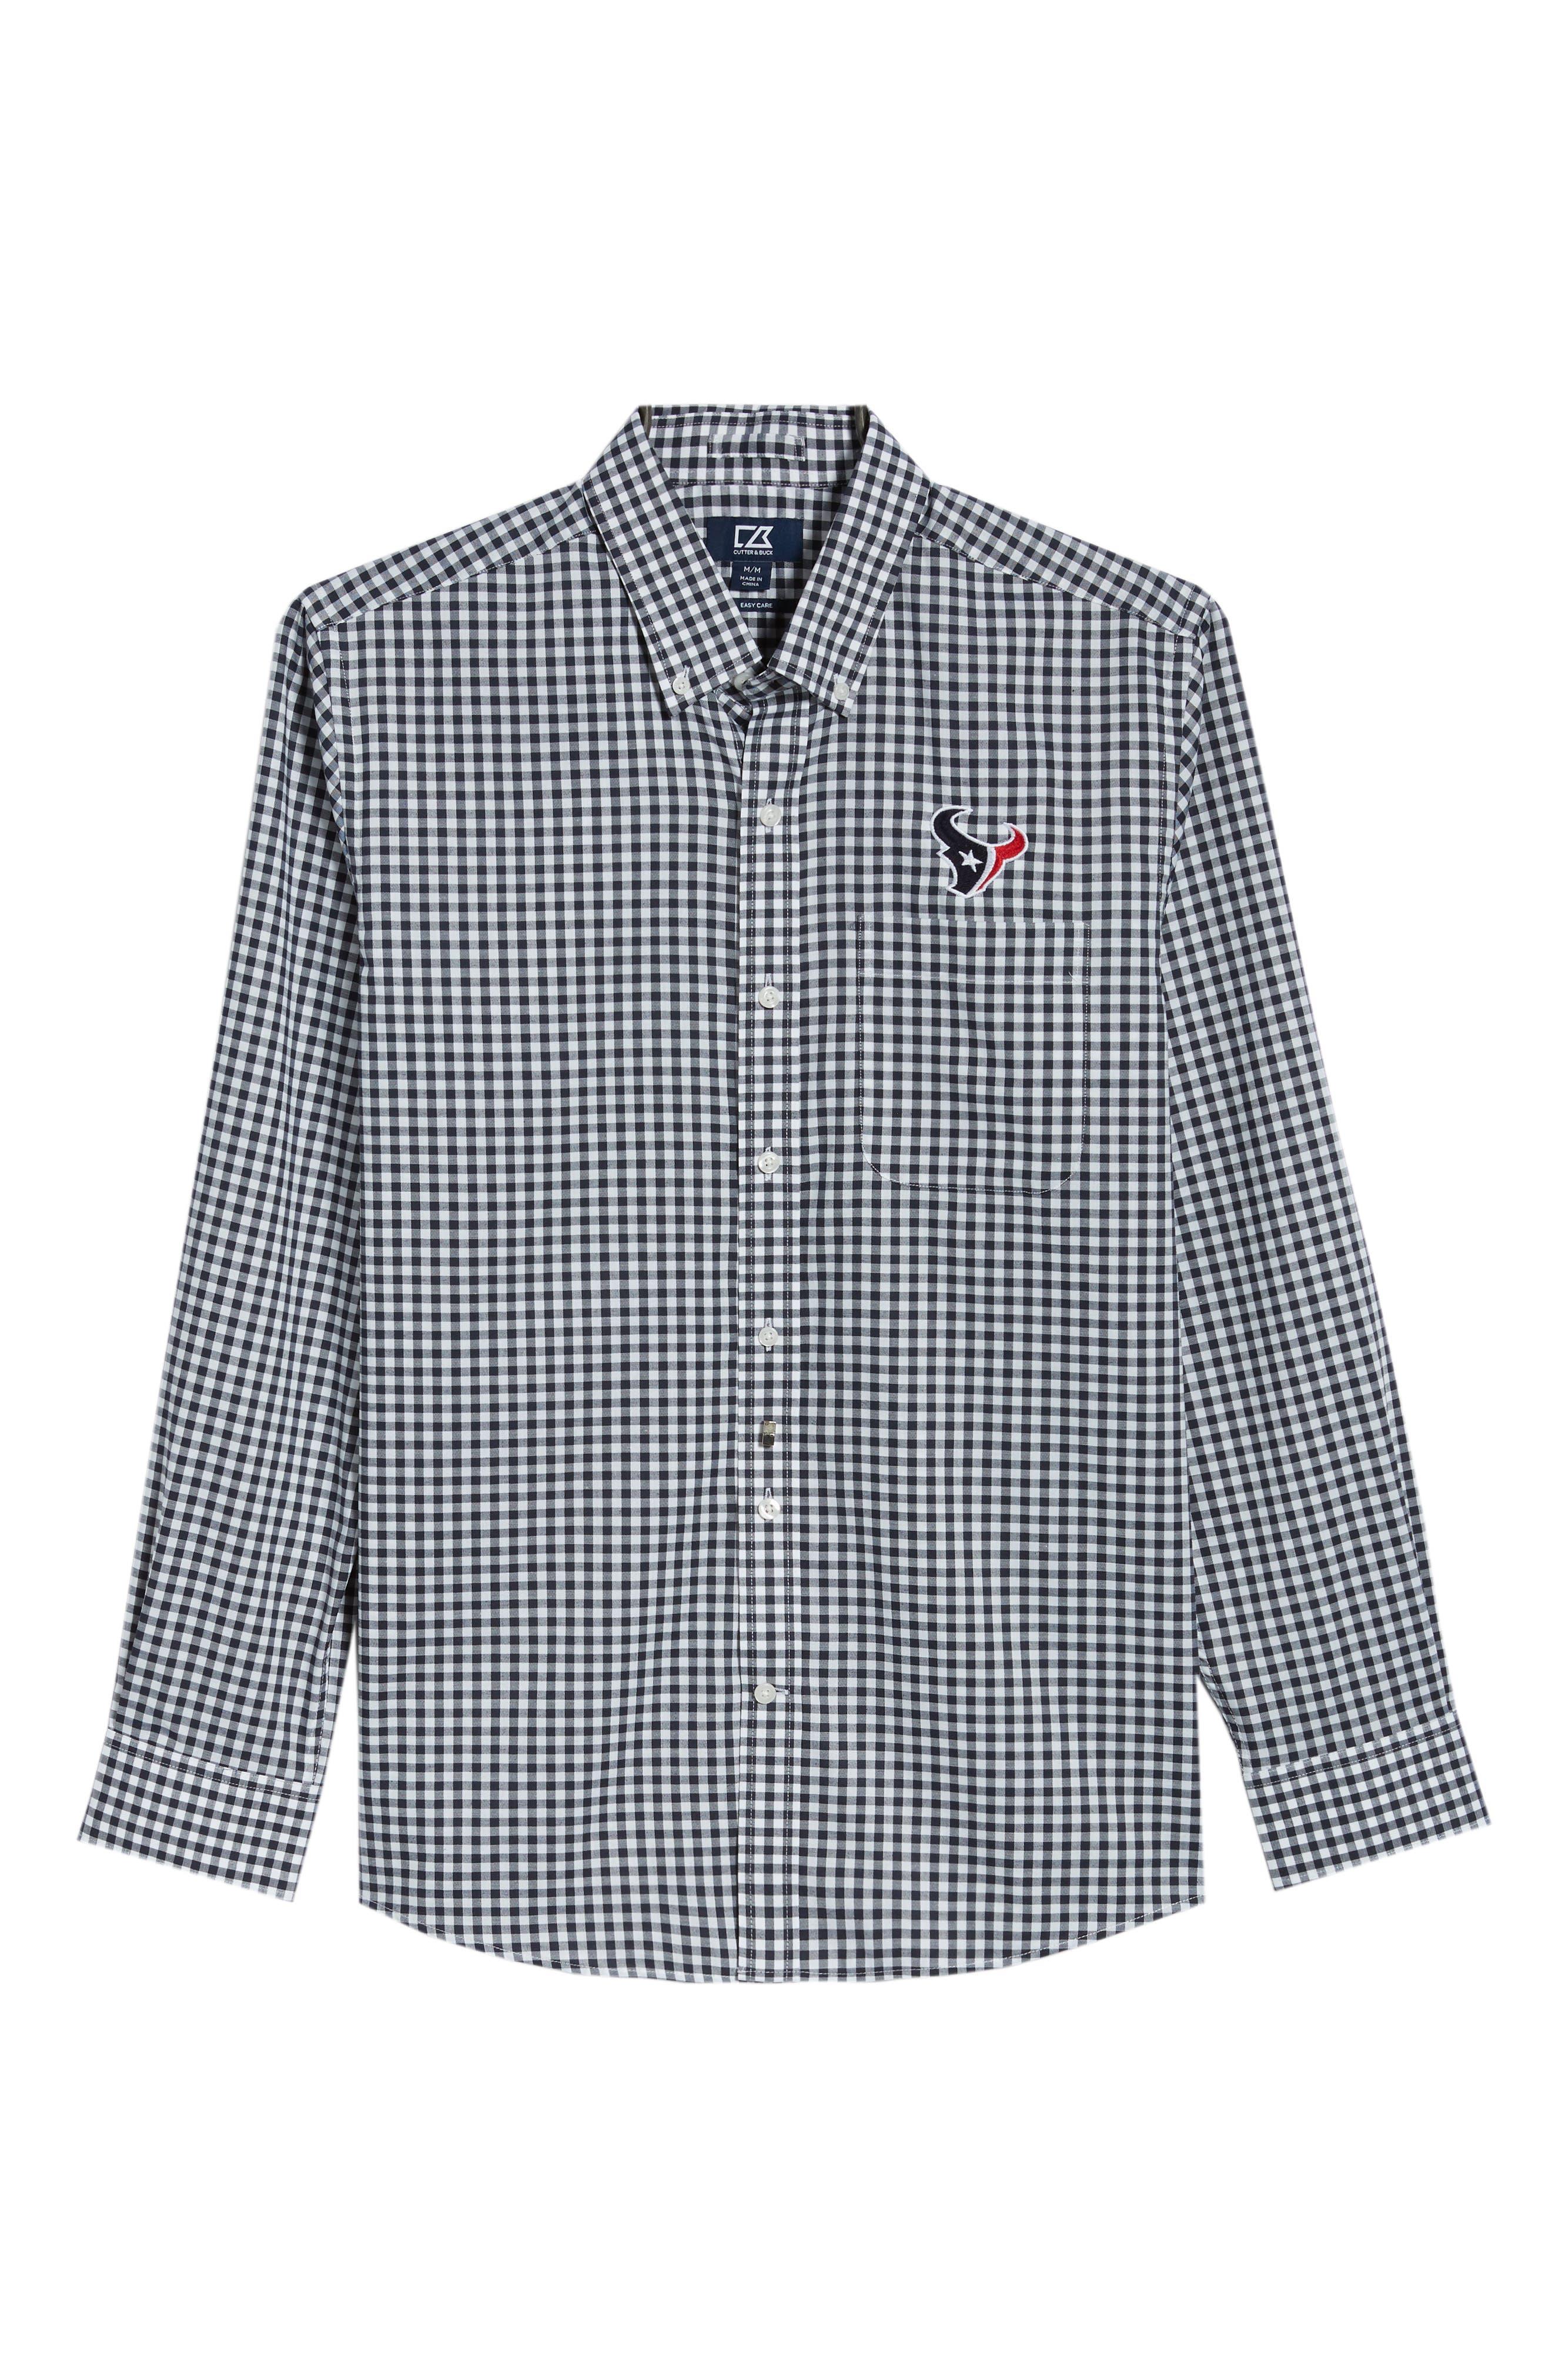 League Houston Texans Regular Fit Shirt,                             Alternate thumbnail 6, color,                             LIBERTY NAVY